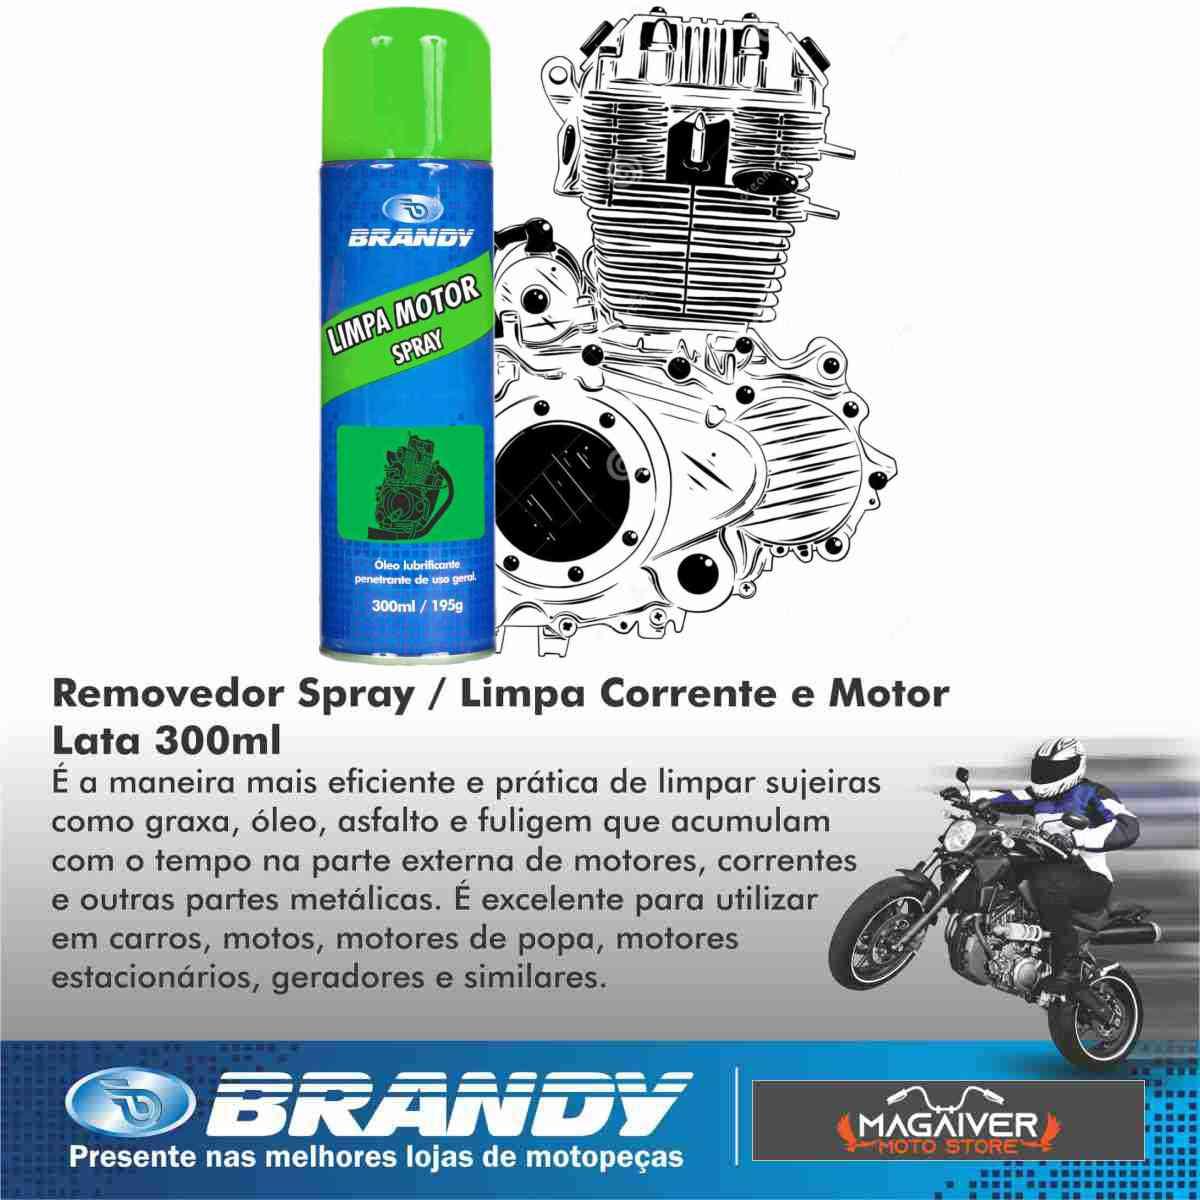 KIT 2 GRAXA MOTO BRANDY SPRAY 300ml + 2 REMOVEDOR LIMPADOR CORRENTE E MOTOR 300ml